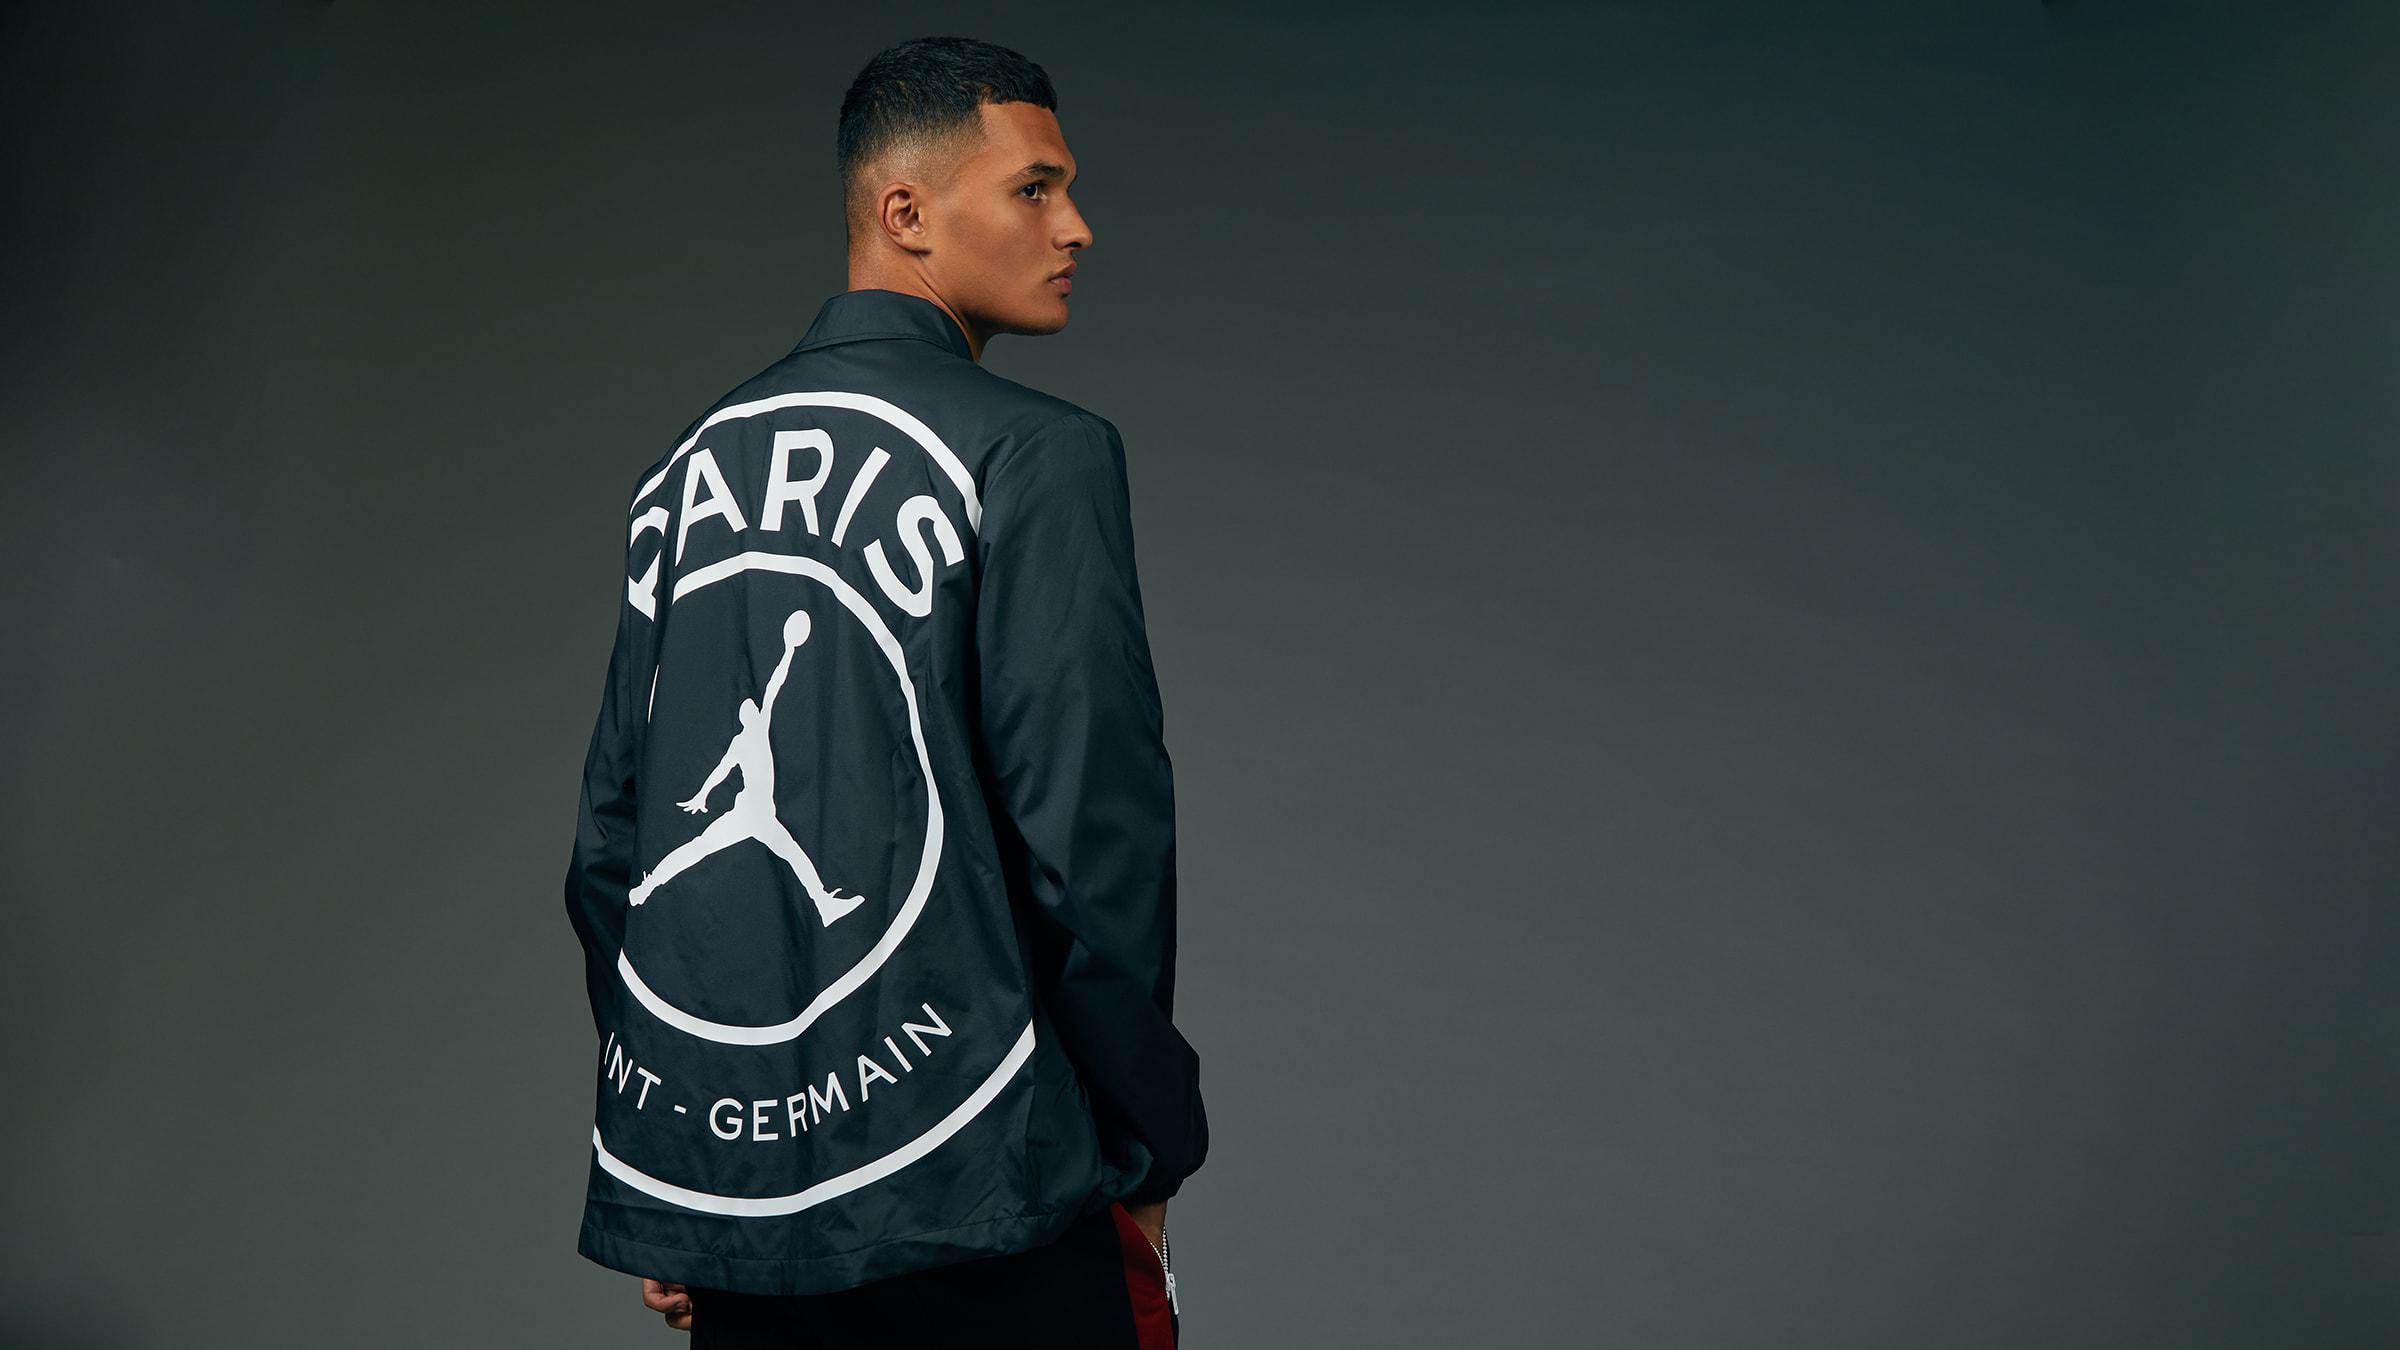 857a09d3b88 Jordan x Paris Saint-Germain Coach Jacket (Black & White)